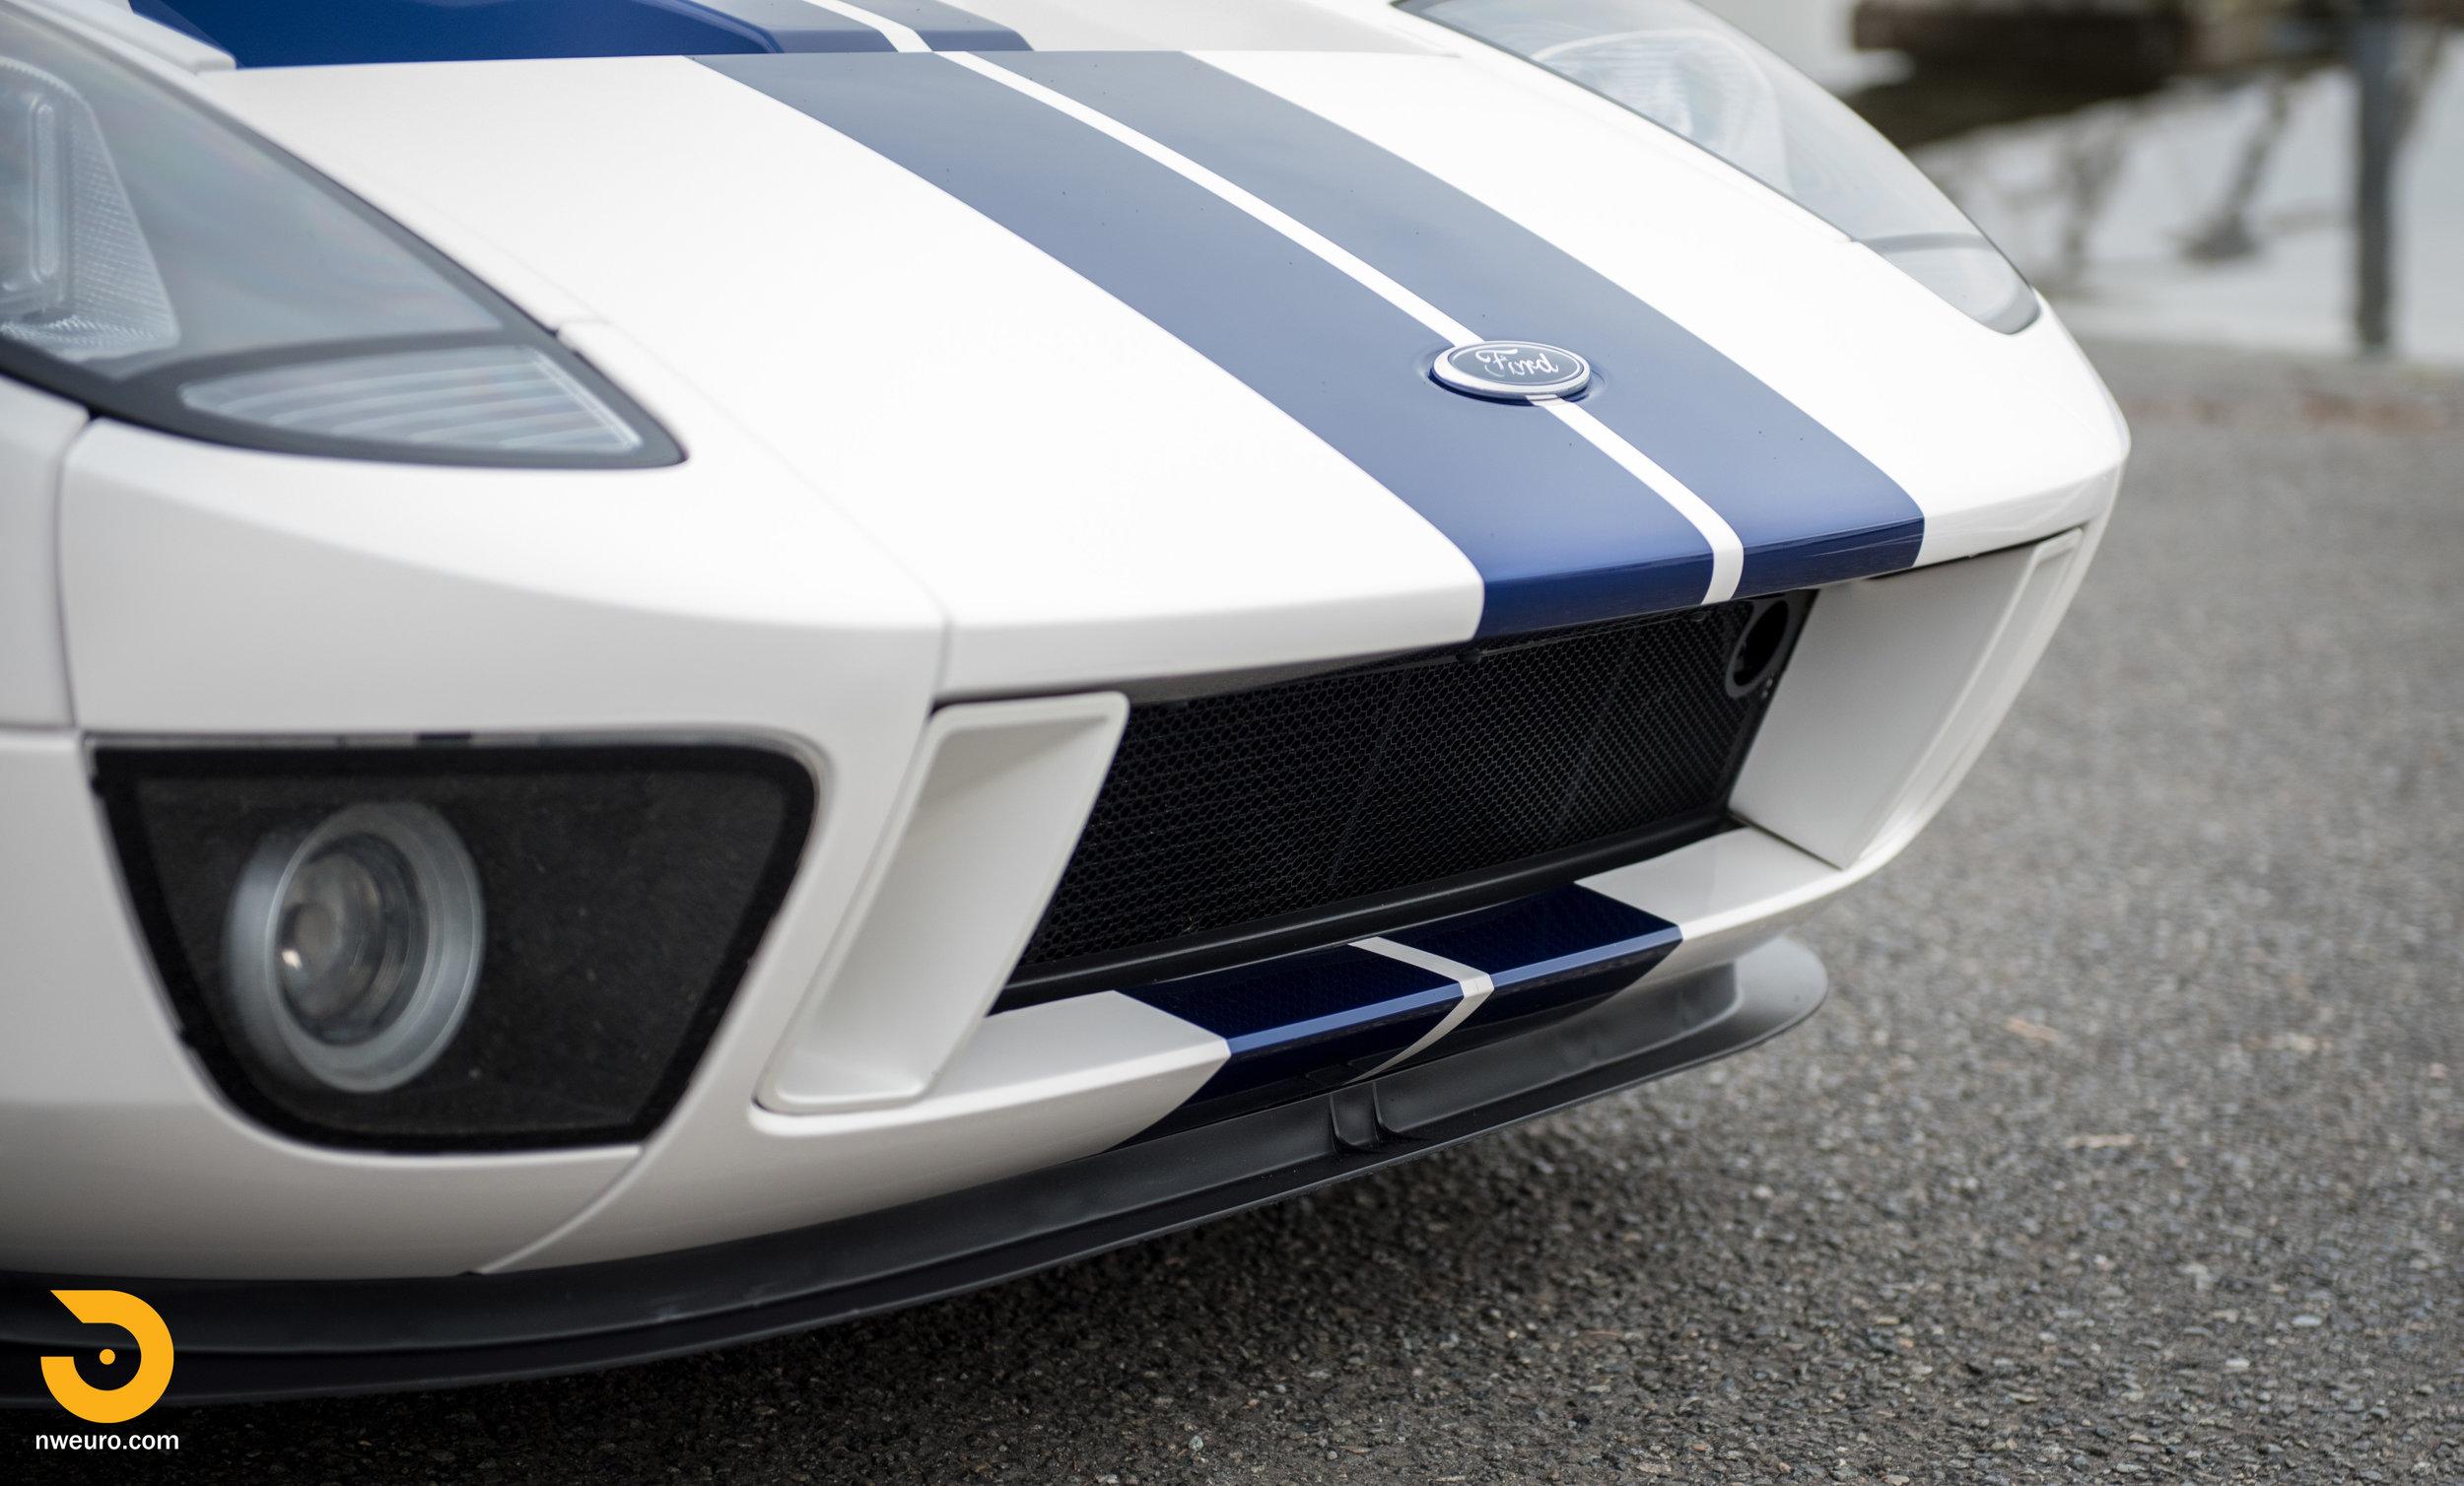 2005 Ford GT-26.jpg